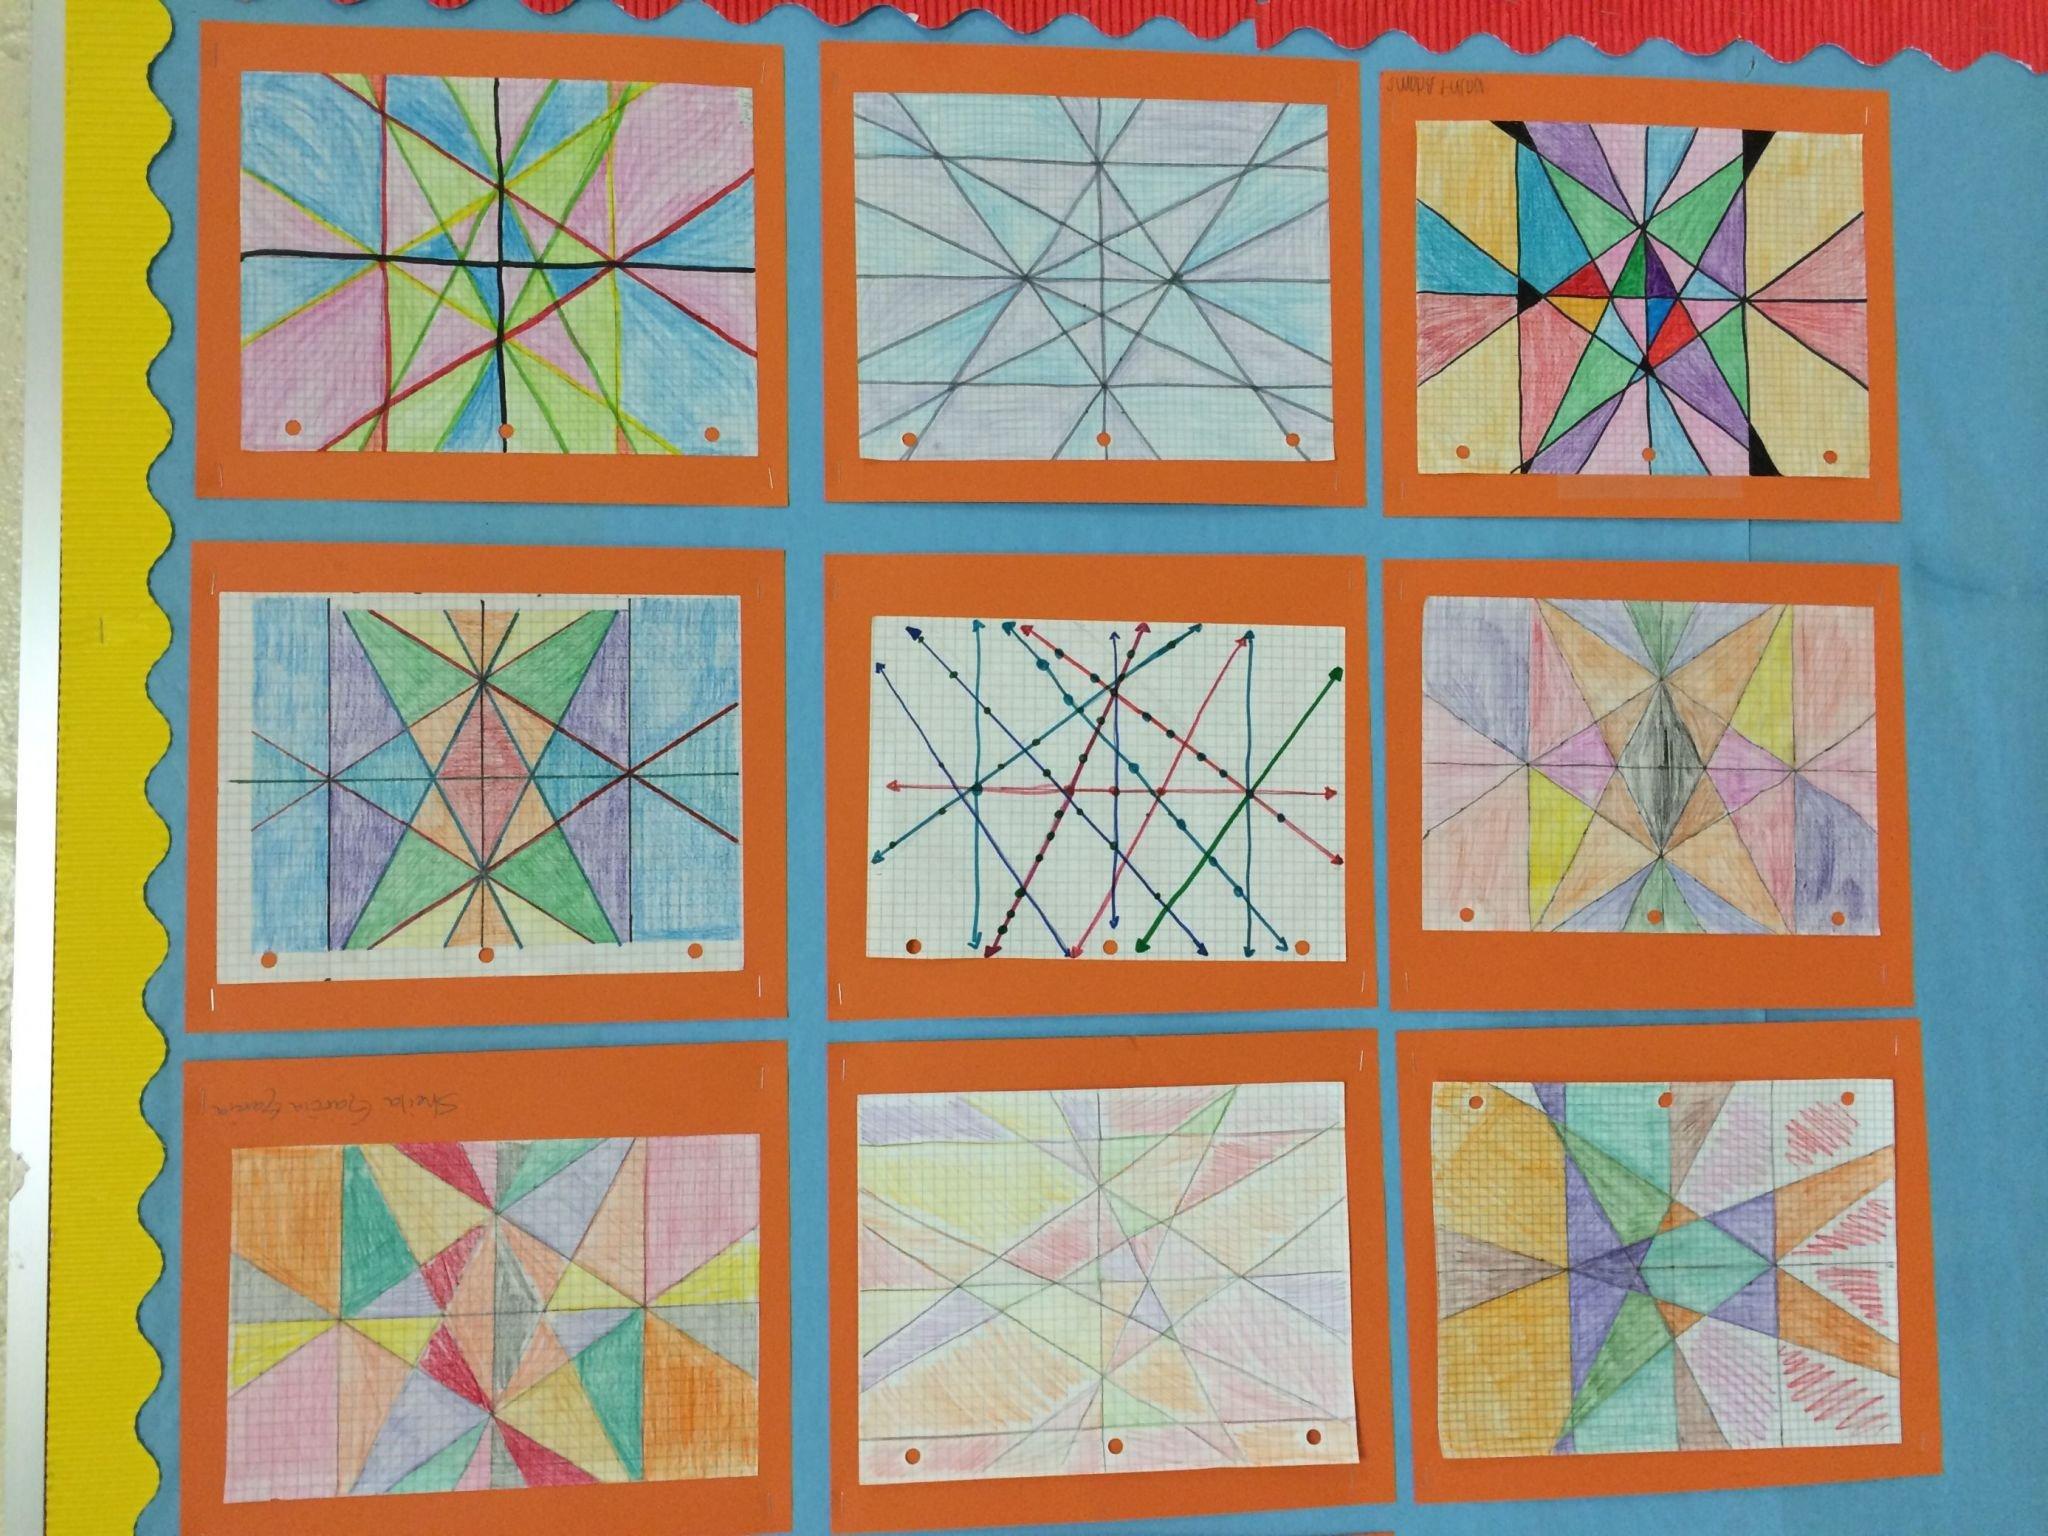 Stained Glass Blueprints Math Worksheet Answers  Briefencounters With Stained Glass Blueprints Math Worksheet